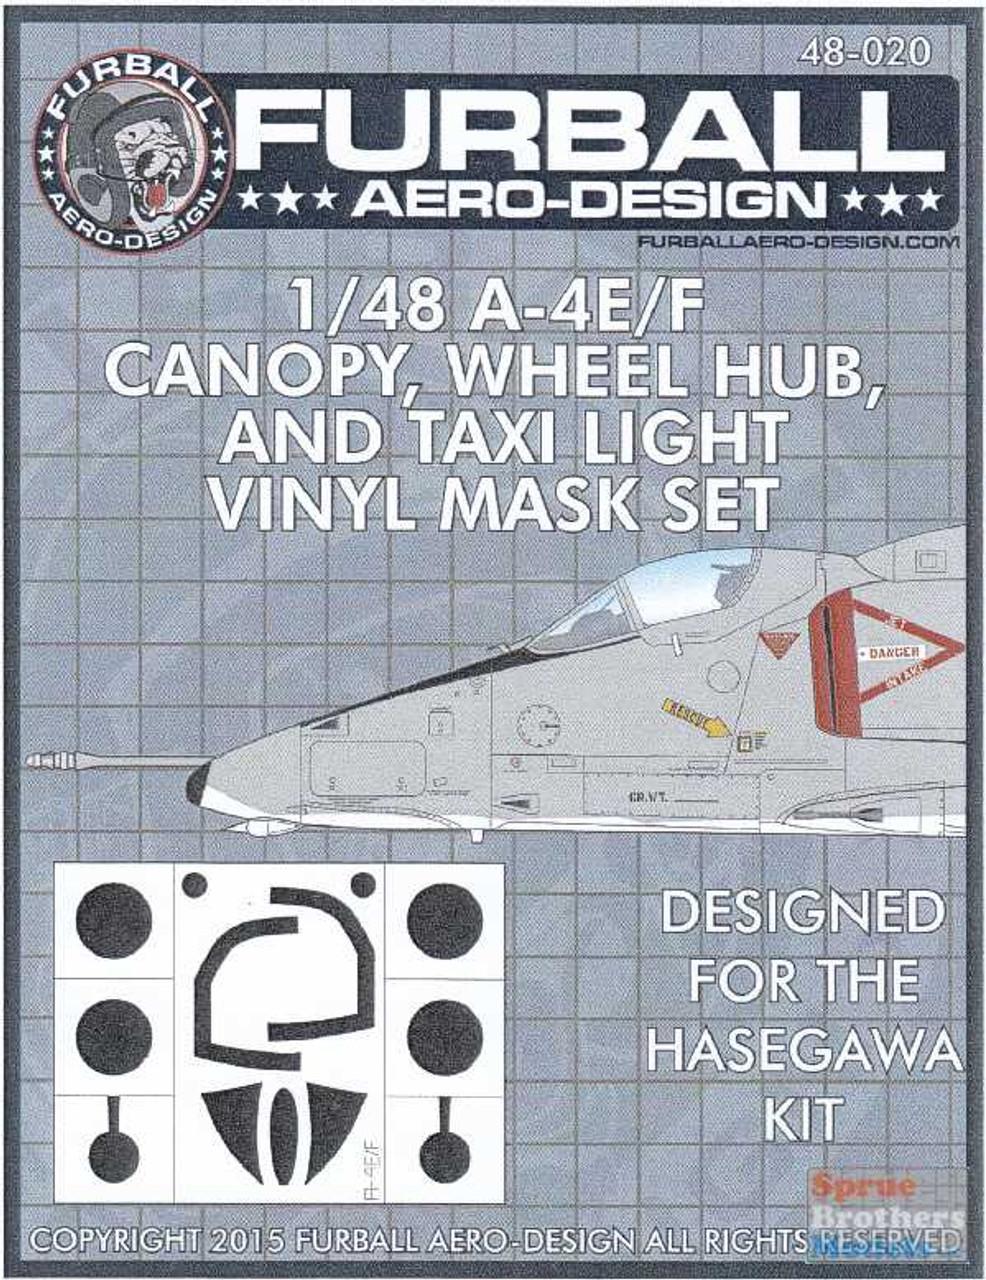 FURFMS020 1:48 Furball Aero Design Canopy, Wheel Hub and Taxi Light Vinyl Mask Set for A-4E A-4F Skyhawk (HAS kit)